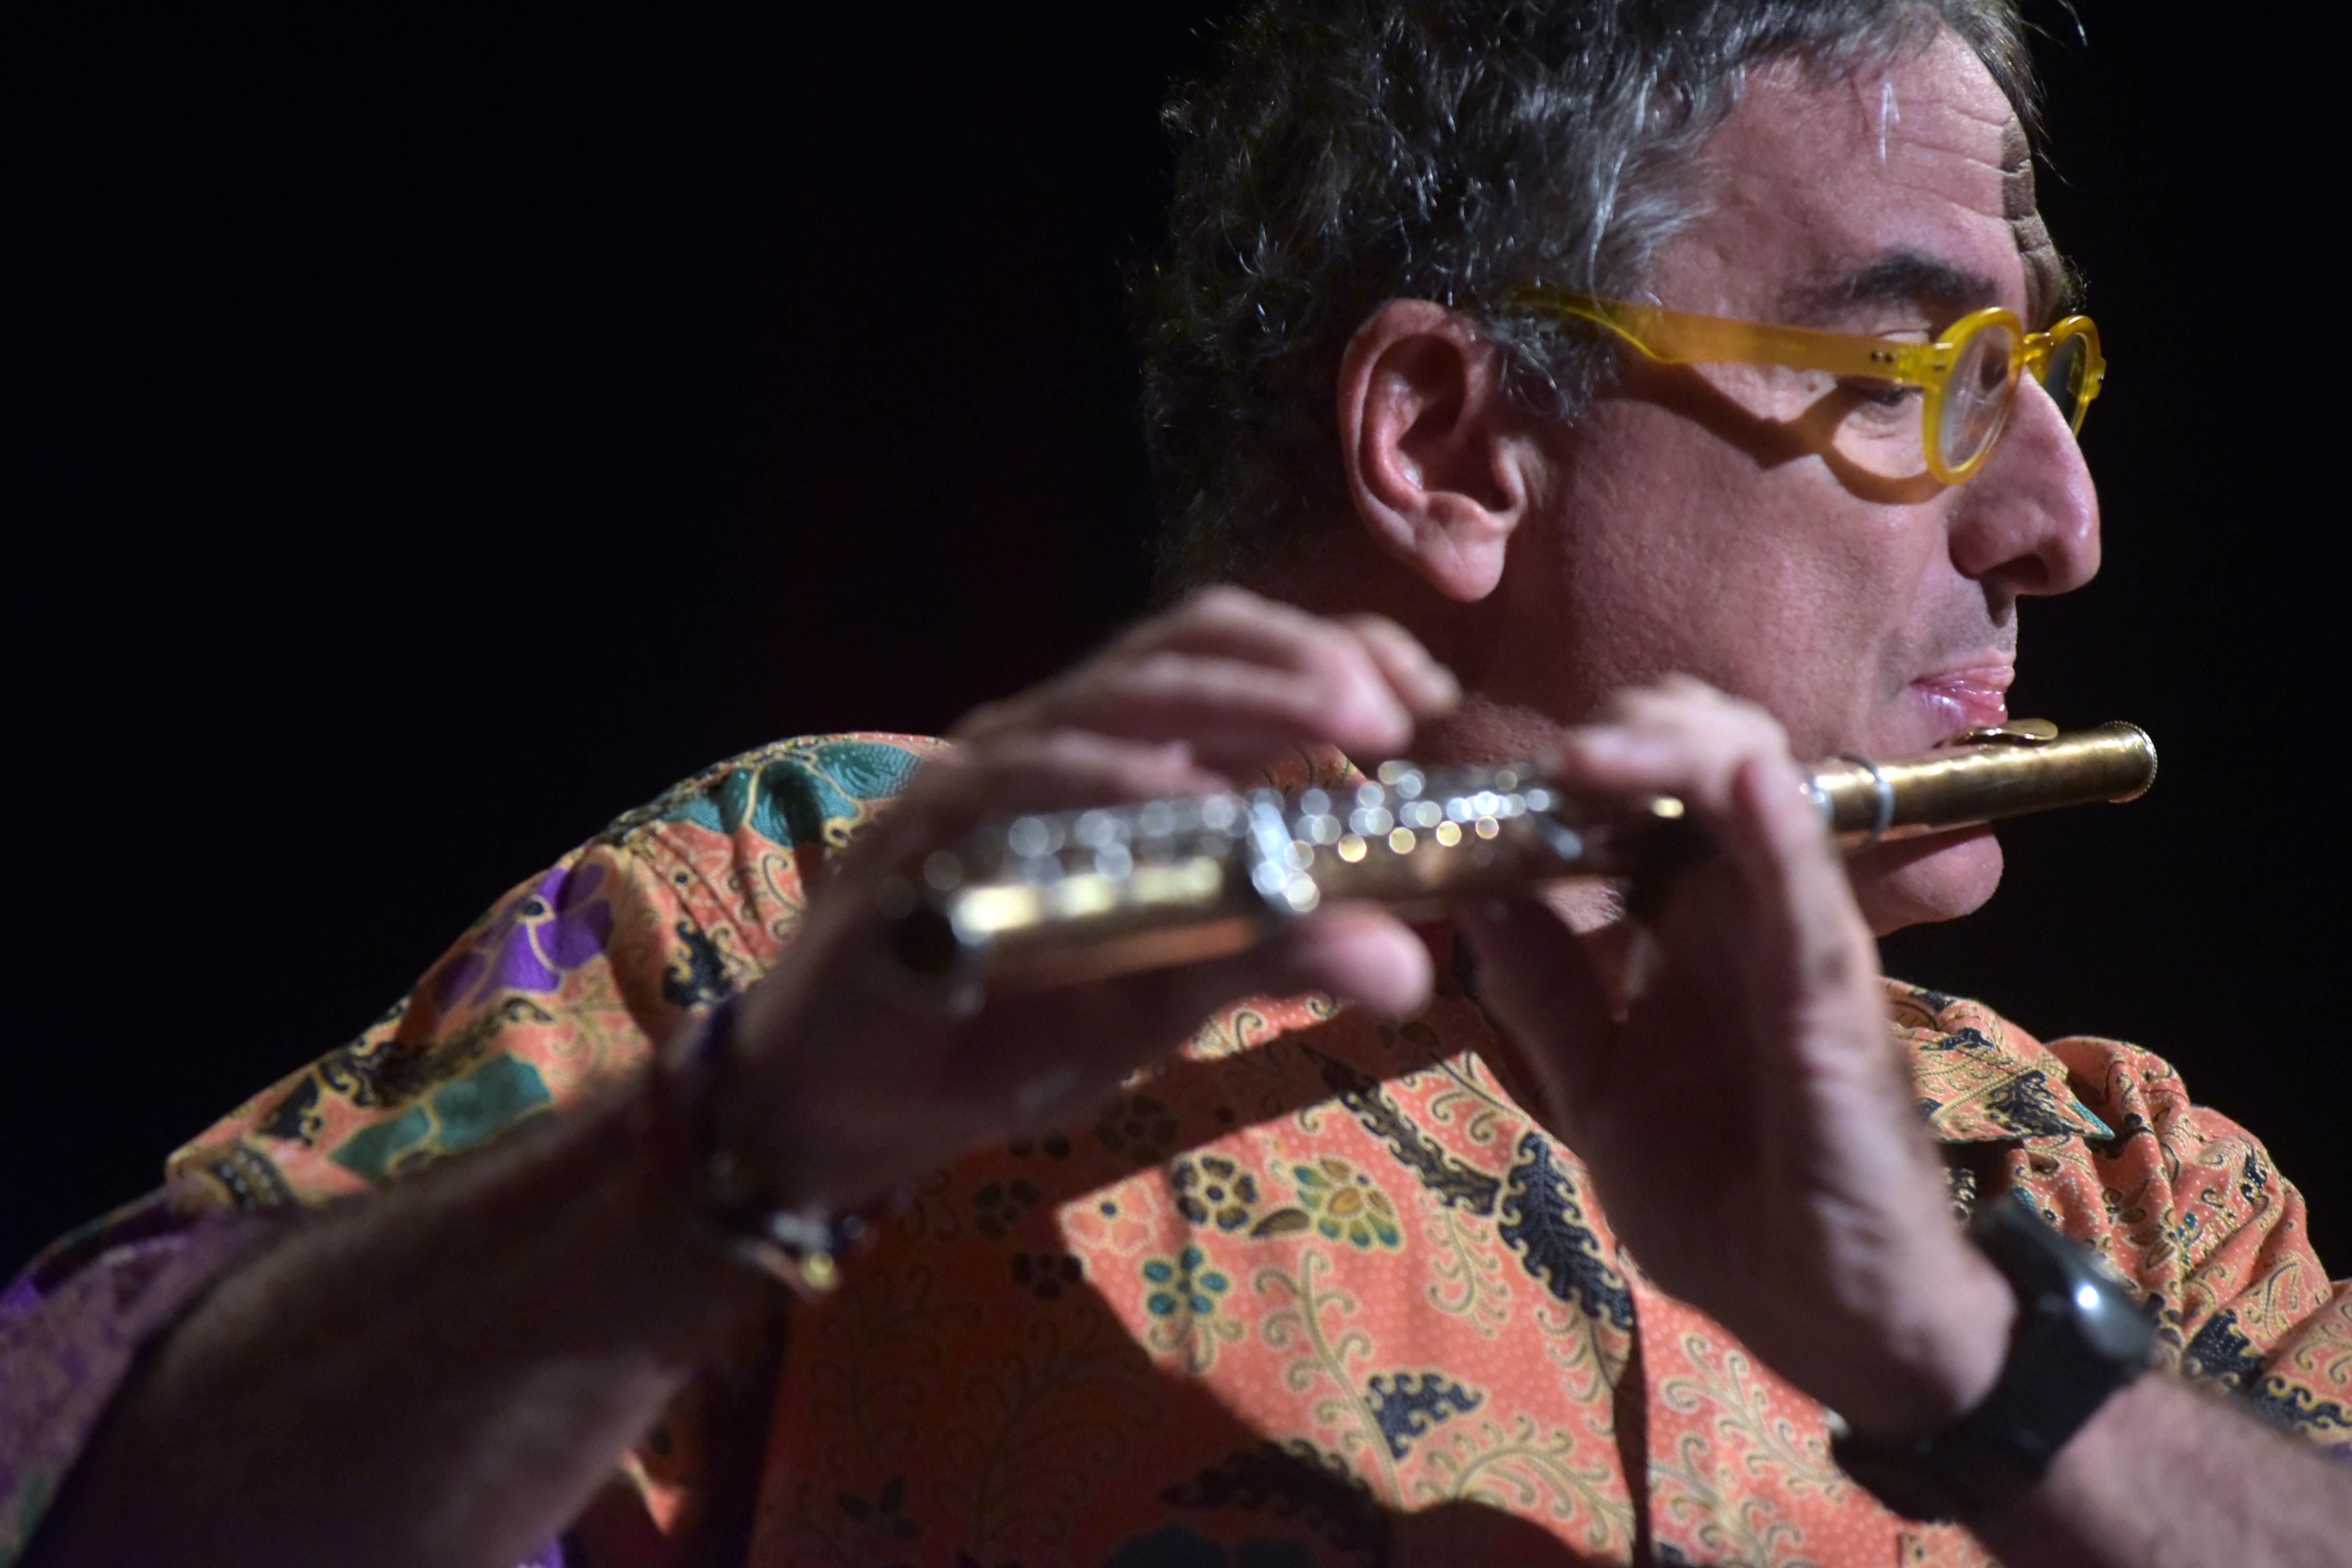 Luis J. Toro, Flautista Venezolano